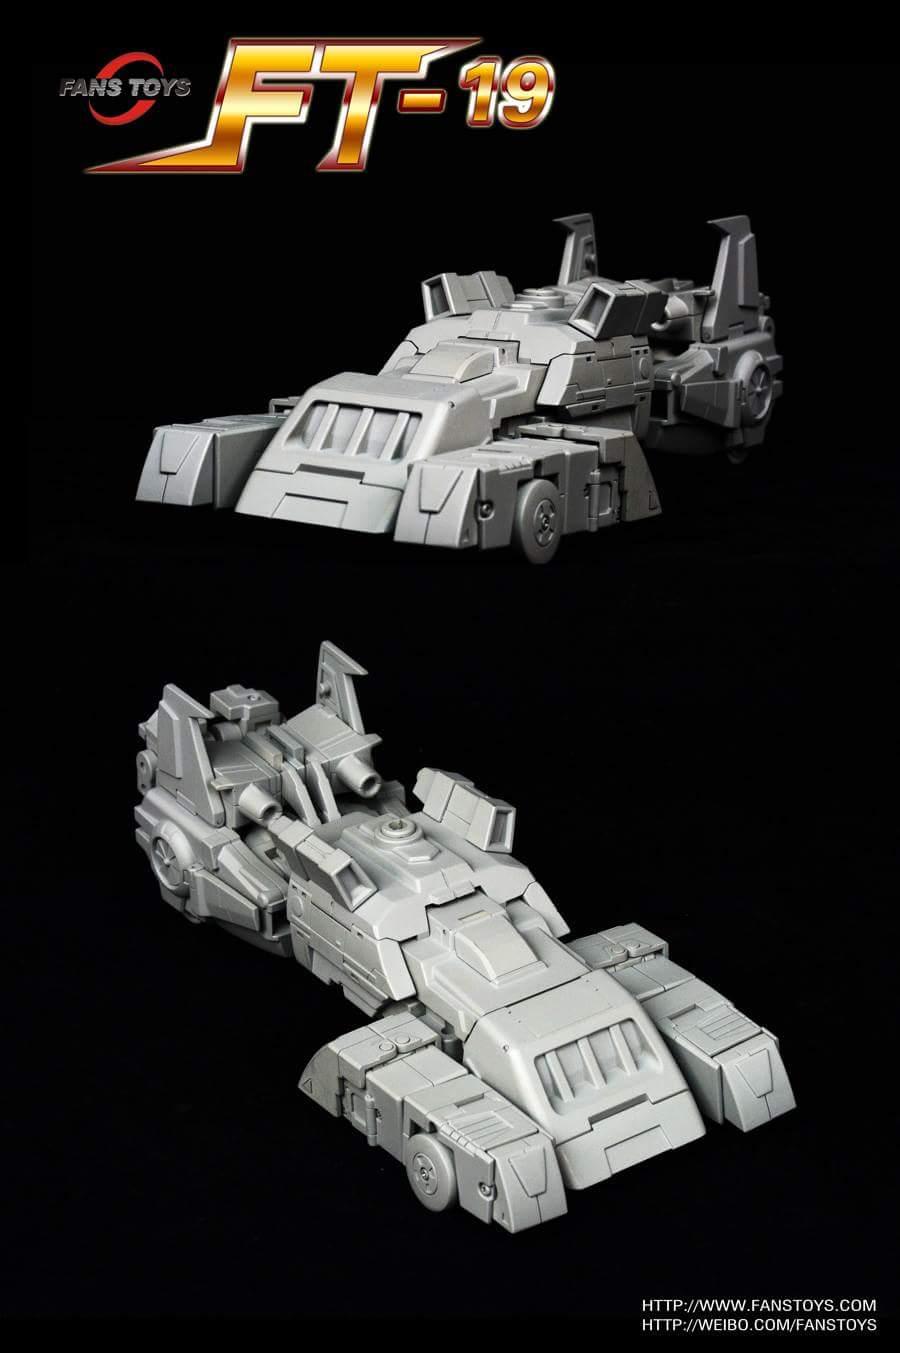 [Fanstoys] Produit Tiers - Jouet FT-19 Apache - aka Springer/Ricochet PEICwLD5